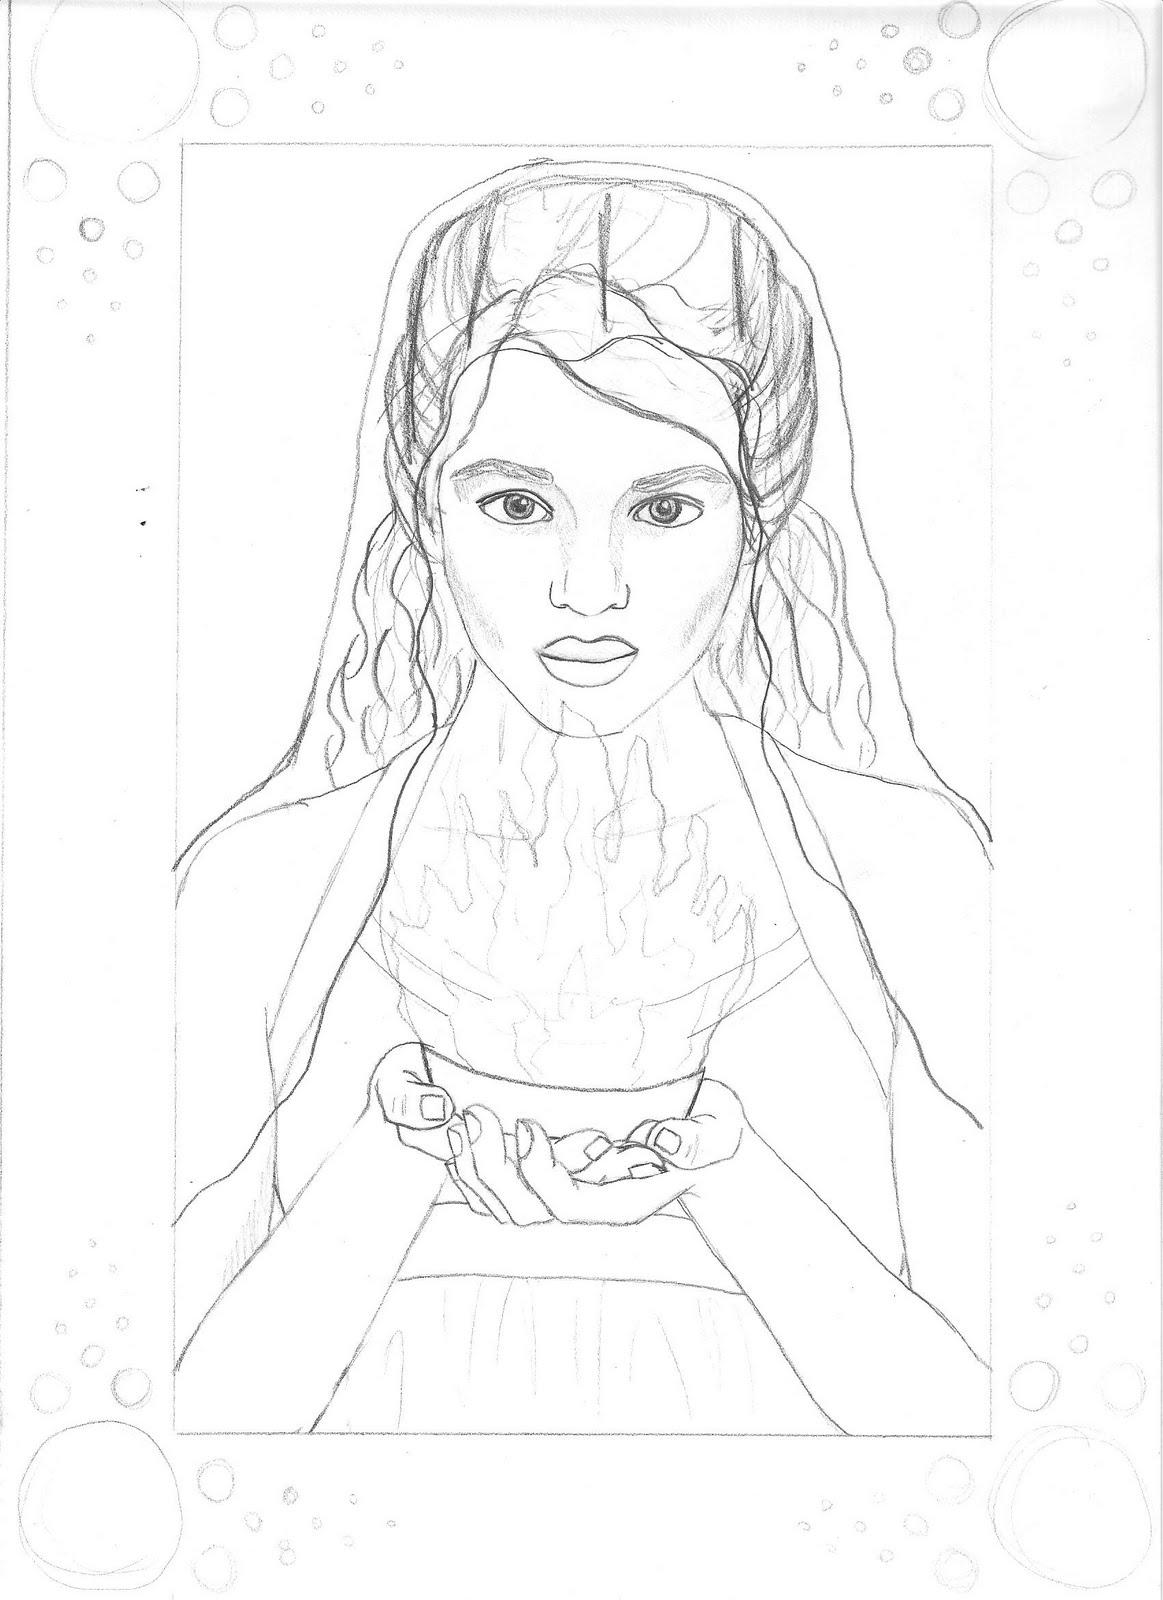 Chrissy's Creative Art Stuff: Sketches of Greek Gods and ...